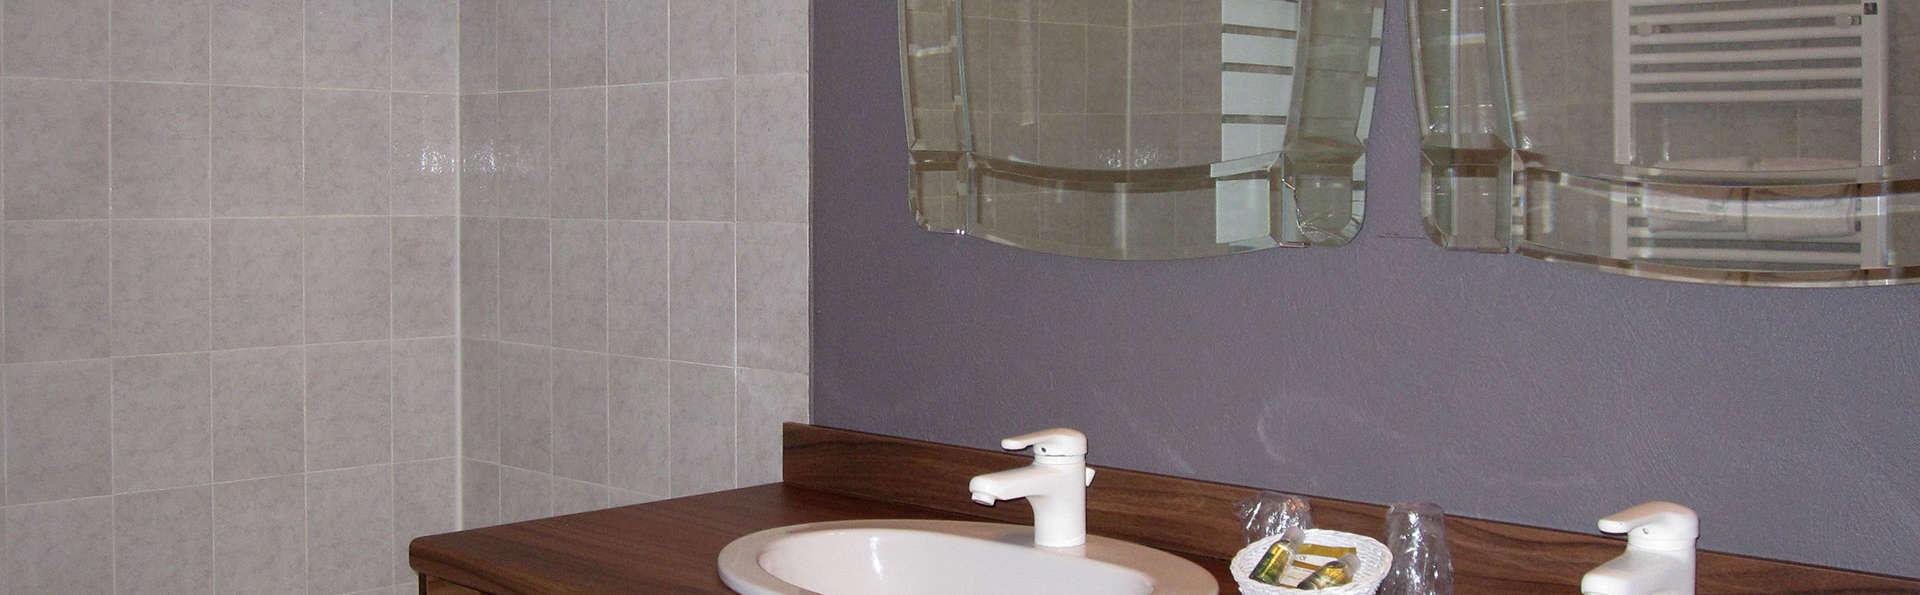 Manoir du Grand Vignoble - edit_bathroom5.jpg